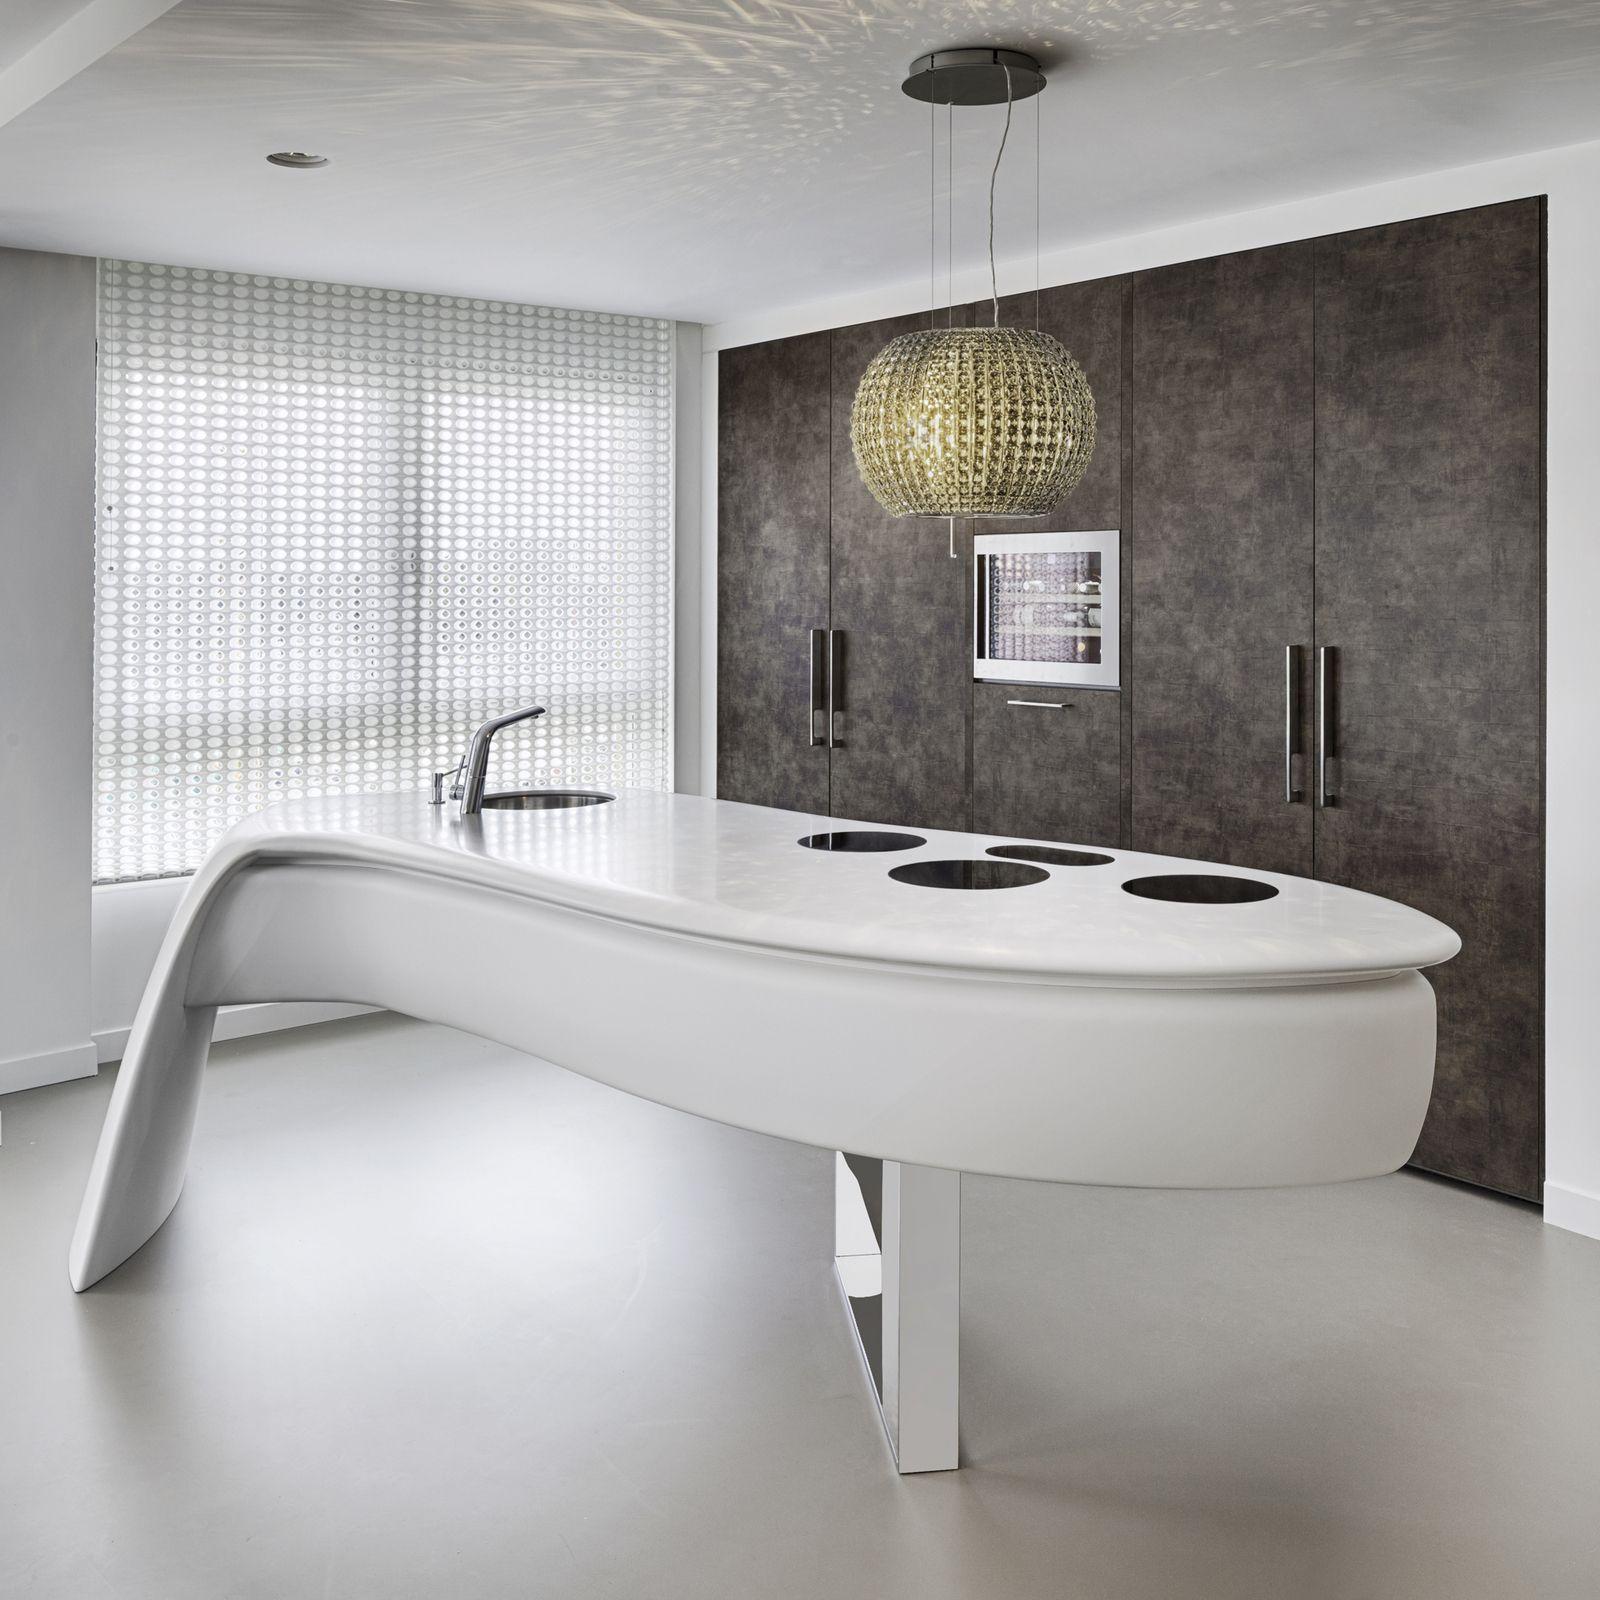 Culimaat - High End Kitchens | Interiors | ITALIAANSE KEUKENS EN ...